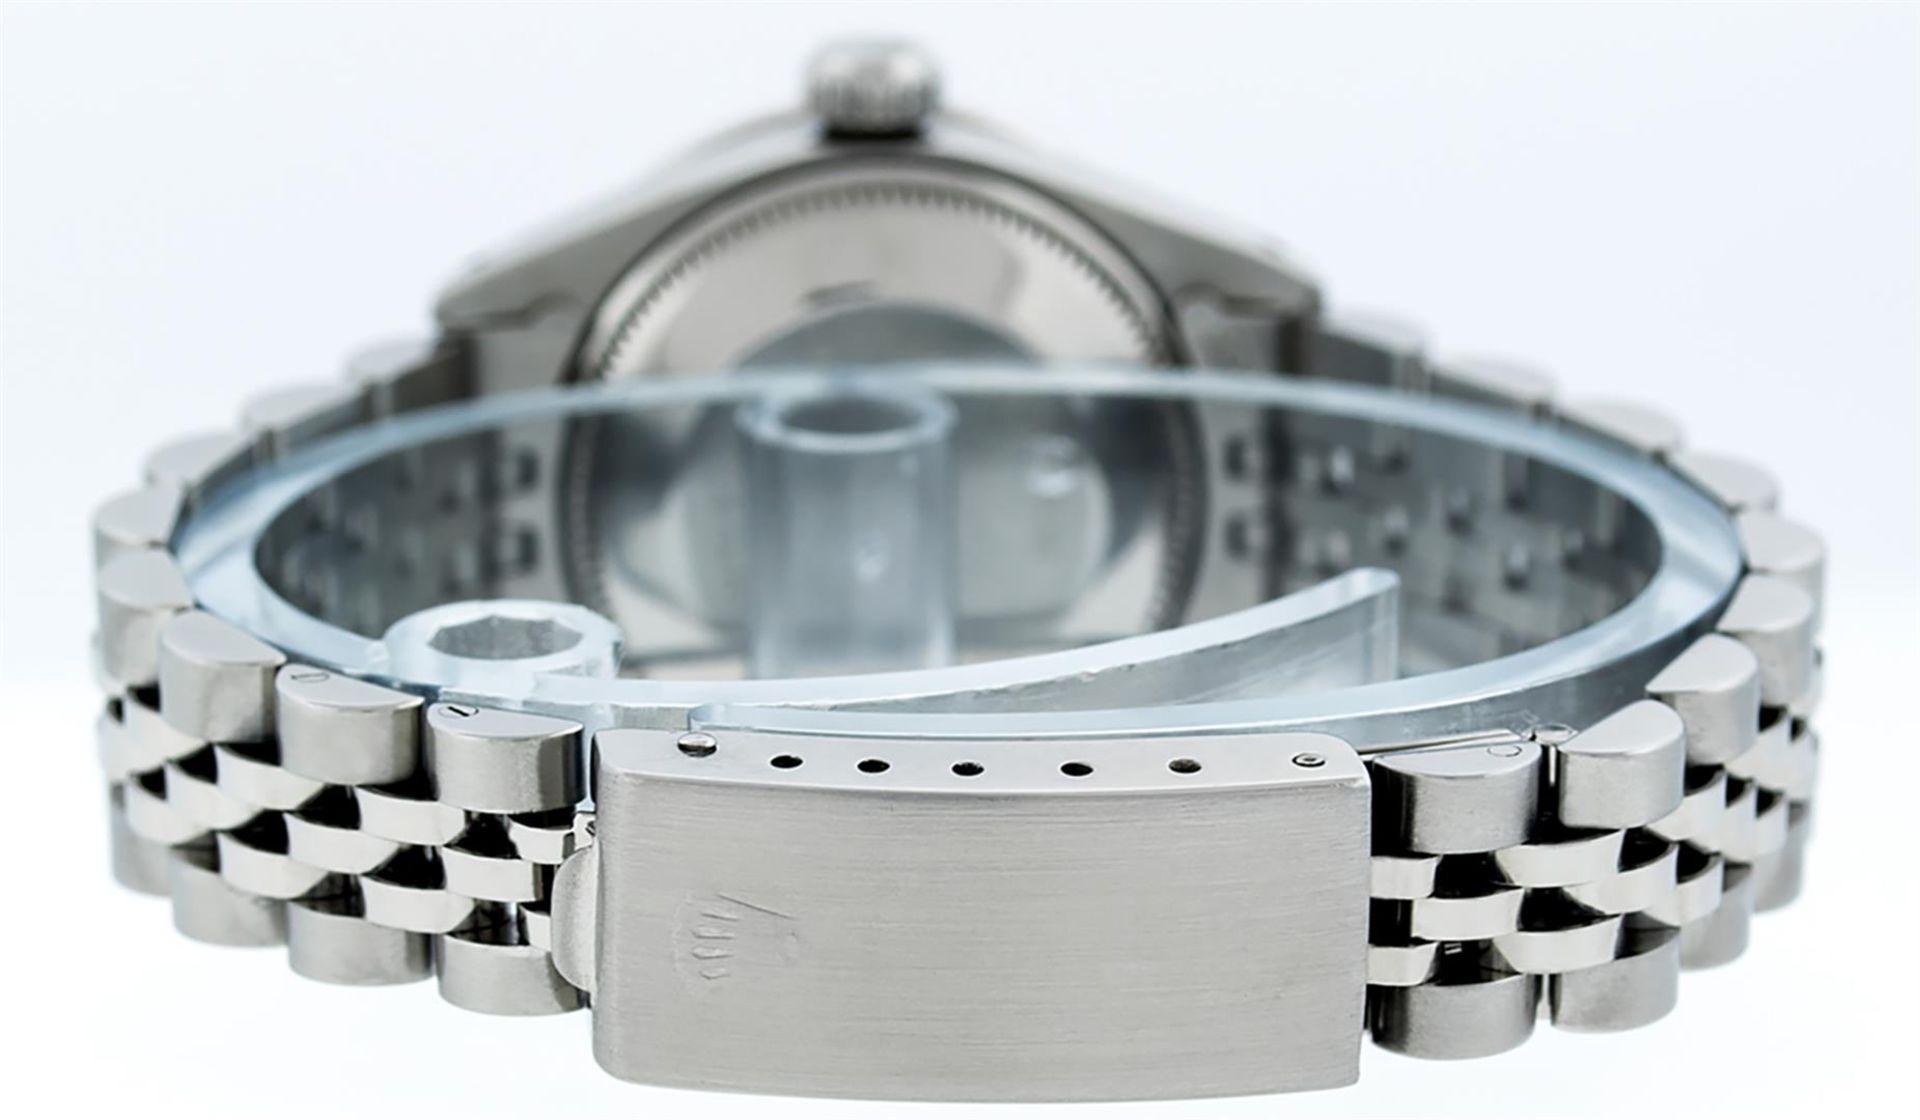 Rolex Ladies Stainless Steel Yellow MOP Emerald & Diamond Datejust Wristwatch - Image 4 of 7